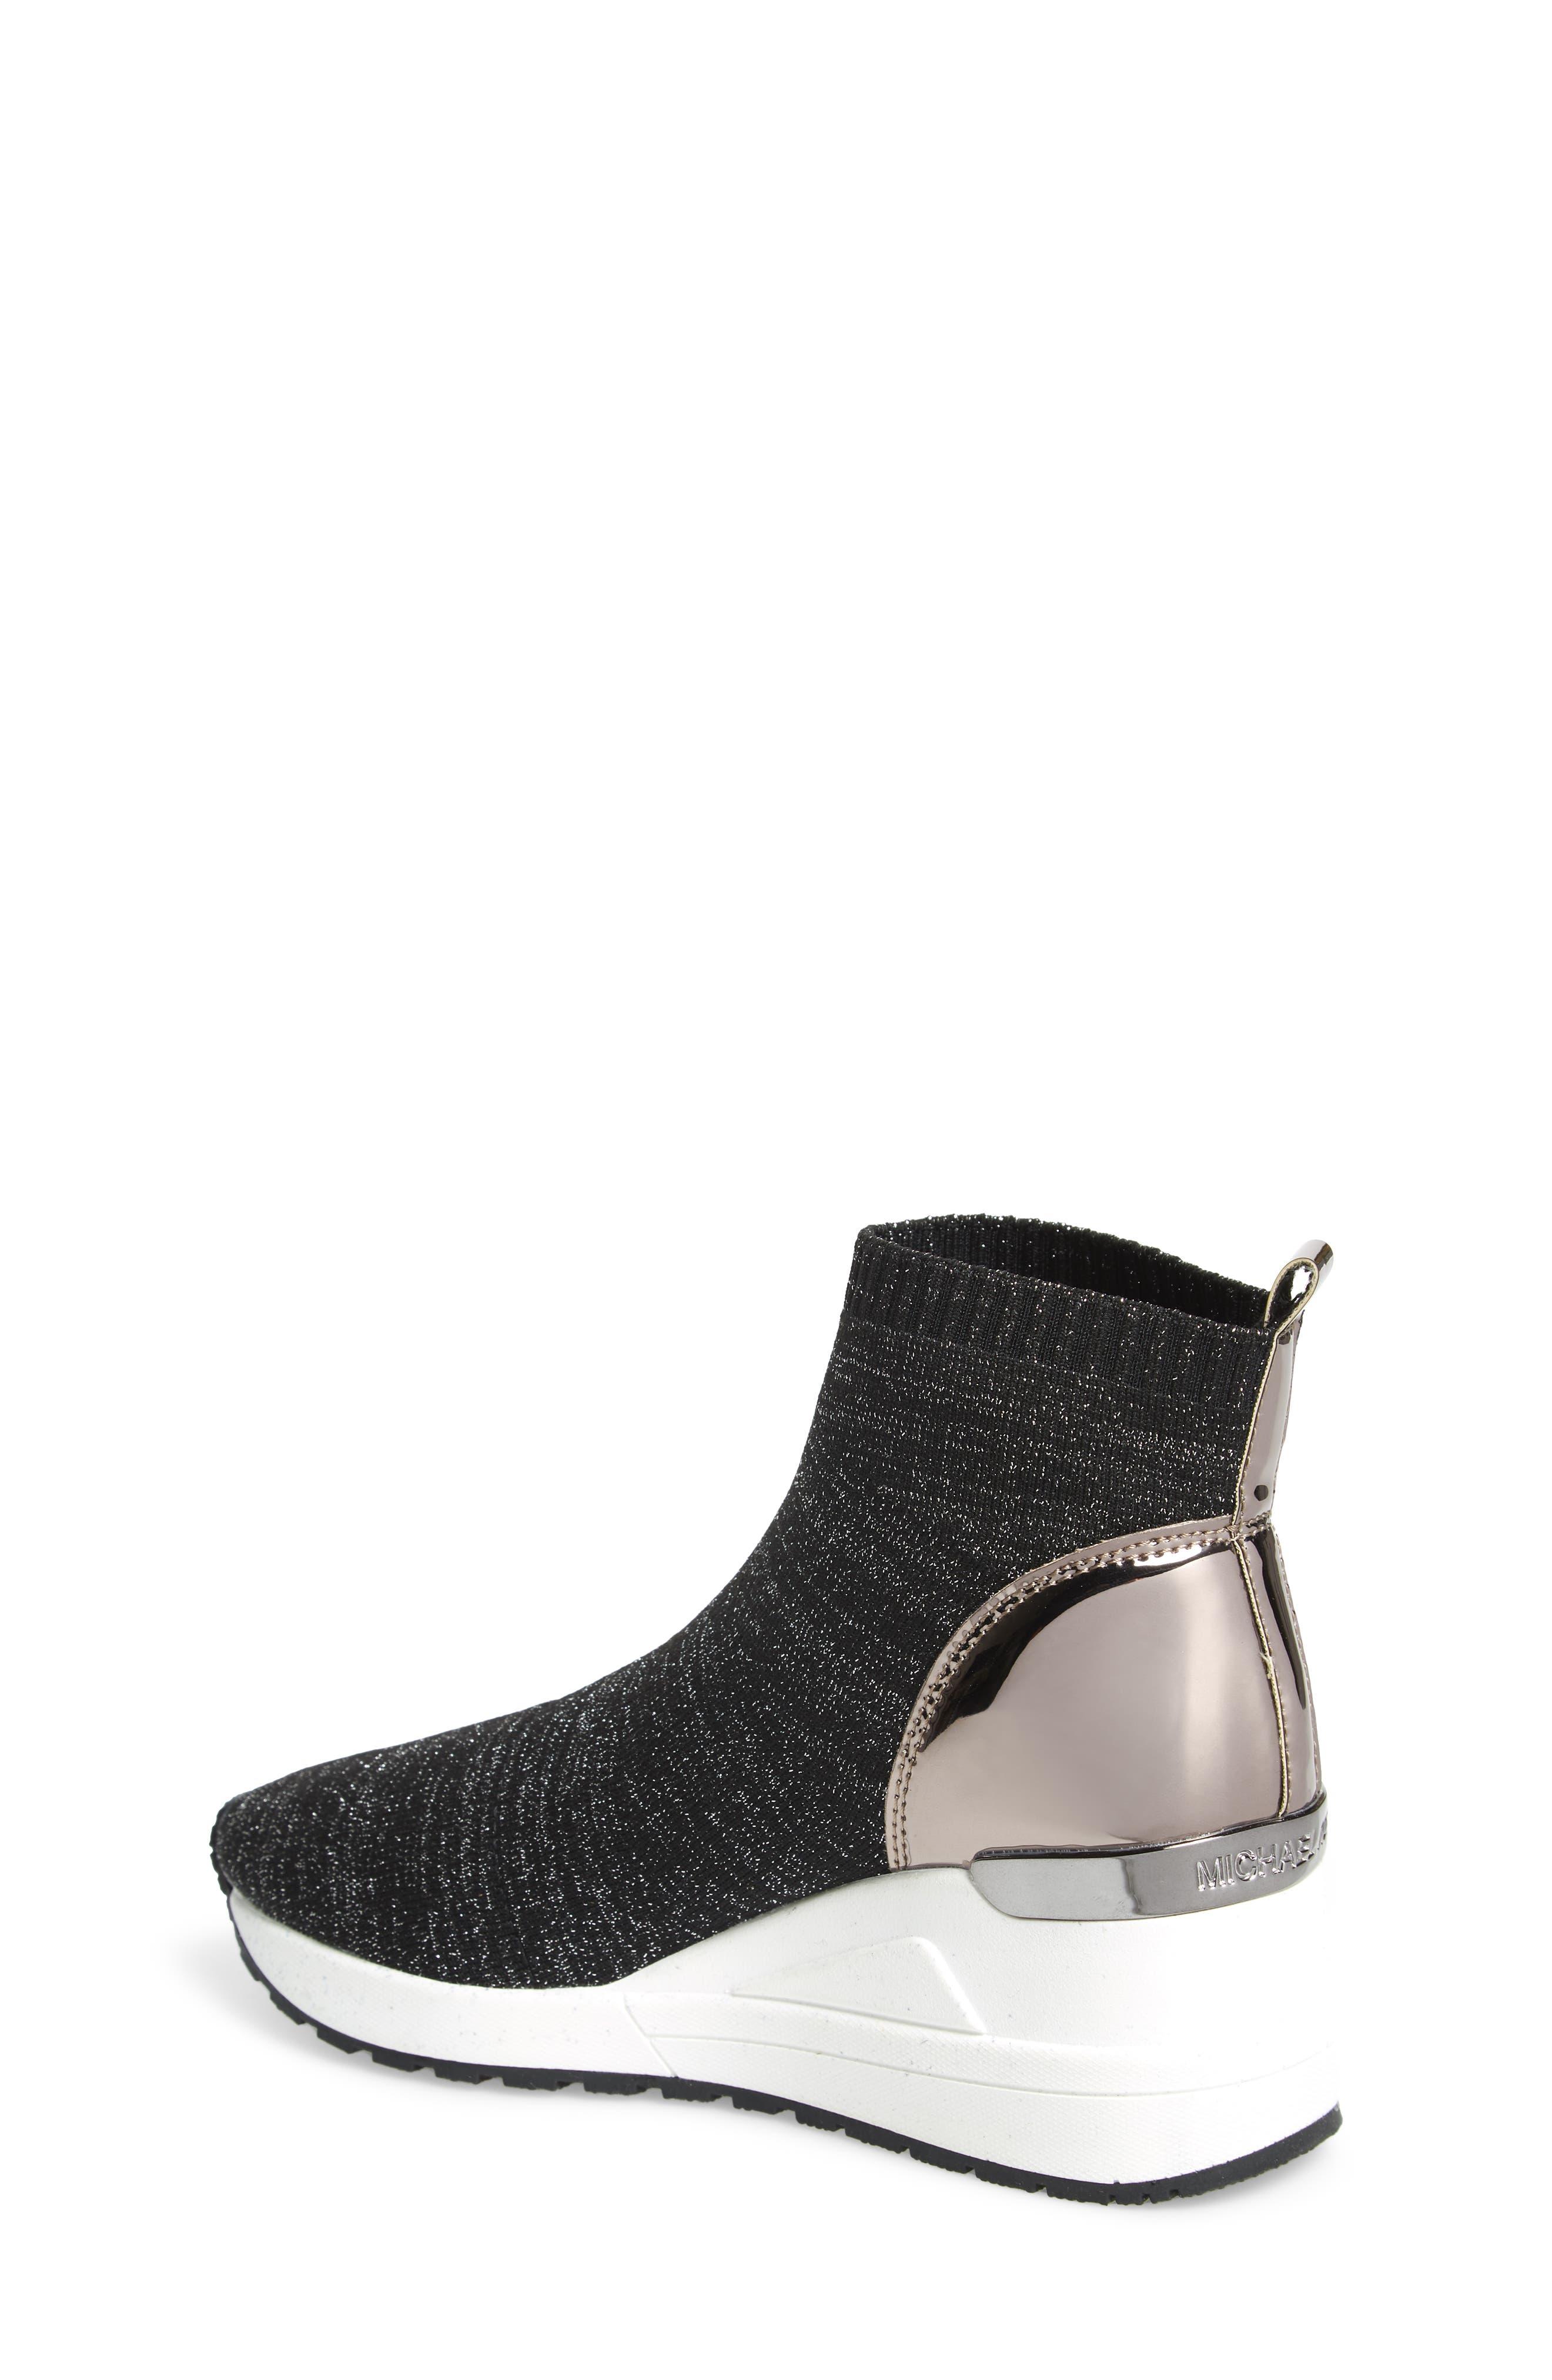 MICHAEL MICHAEL KORS, Neo Flex Metallic Wedge Sneaker, Alternate thumbnail 2, color, BLACK METALLIC